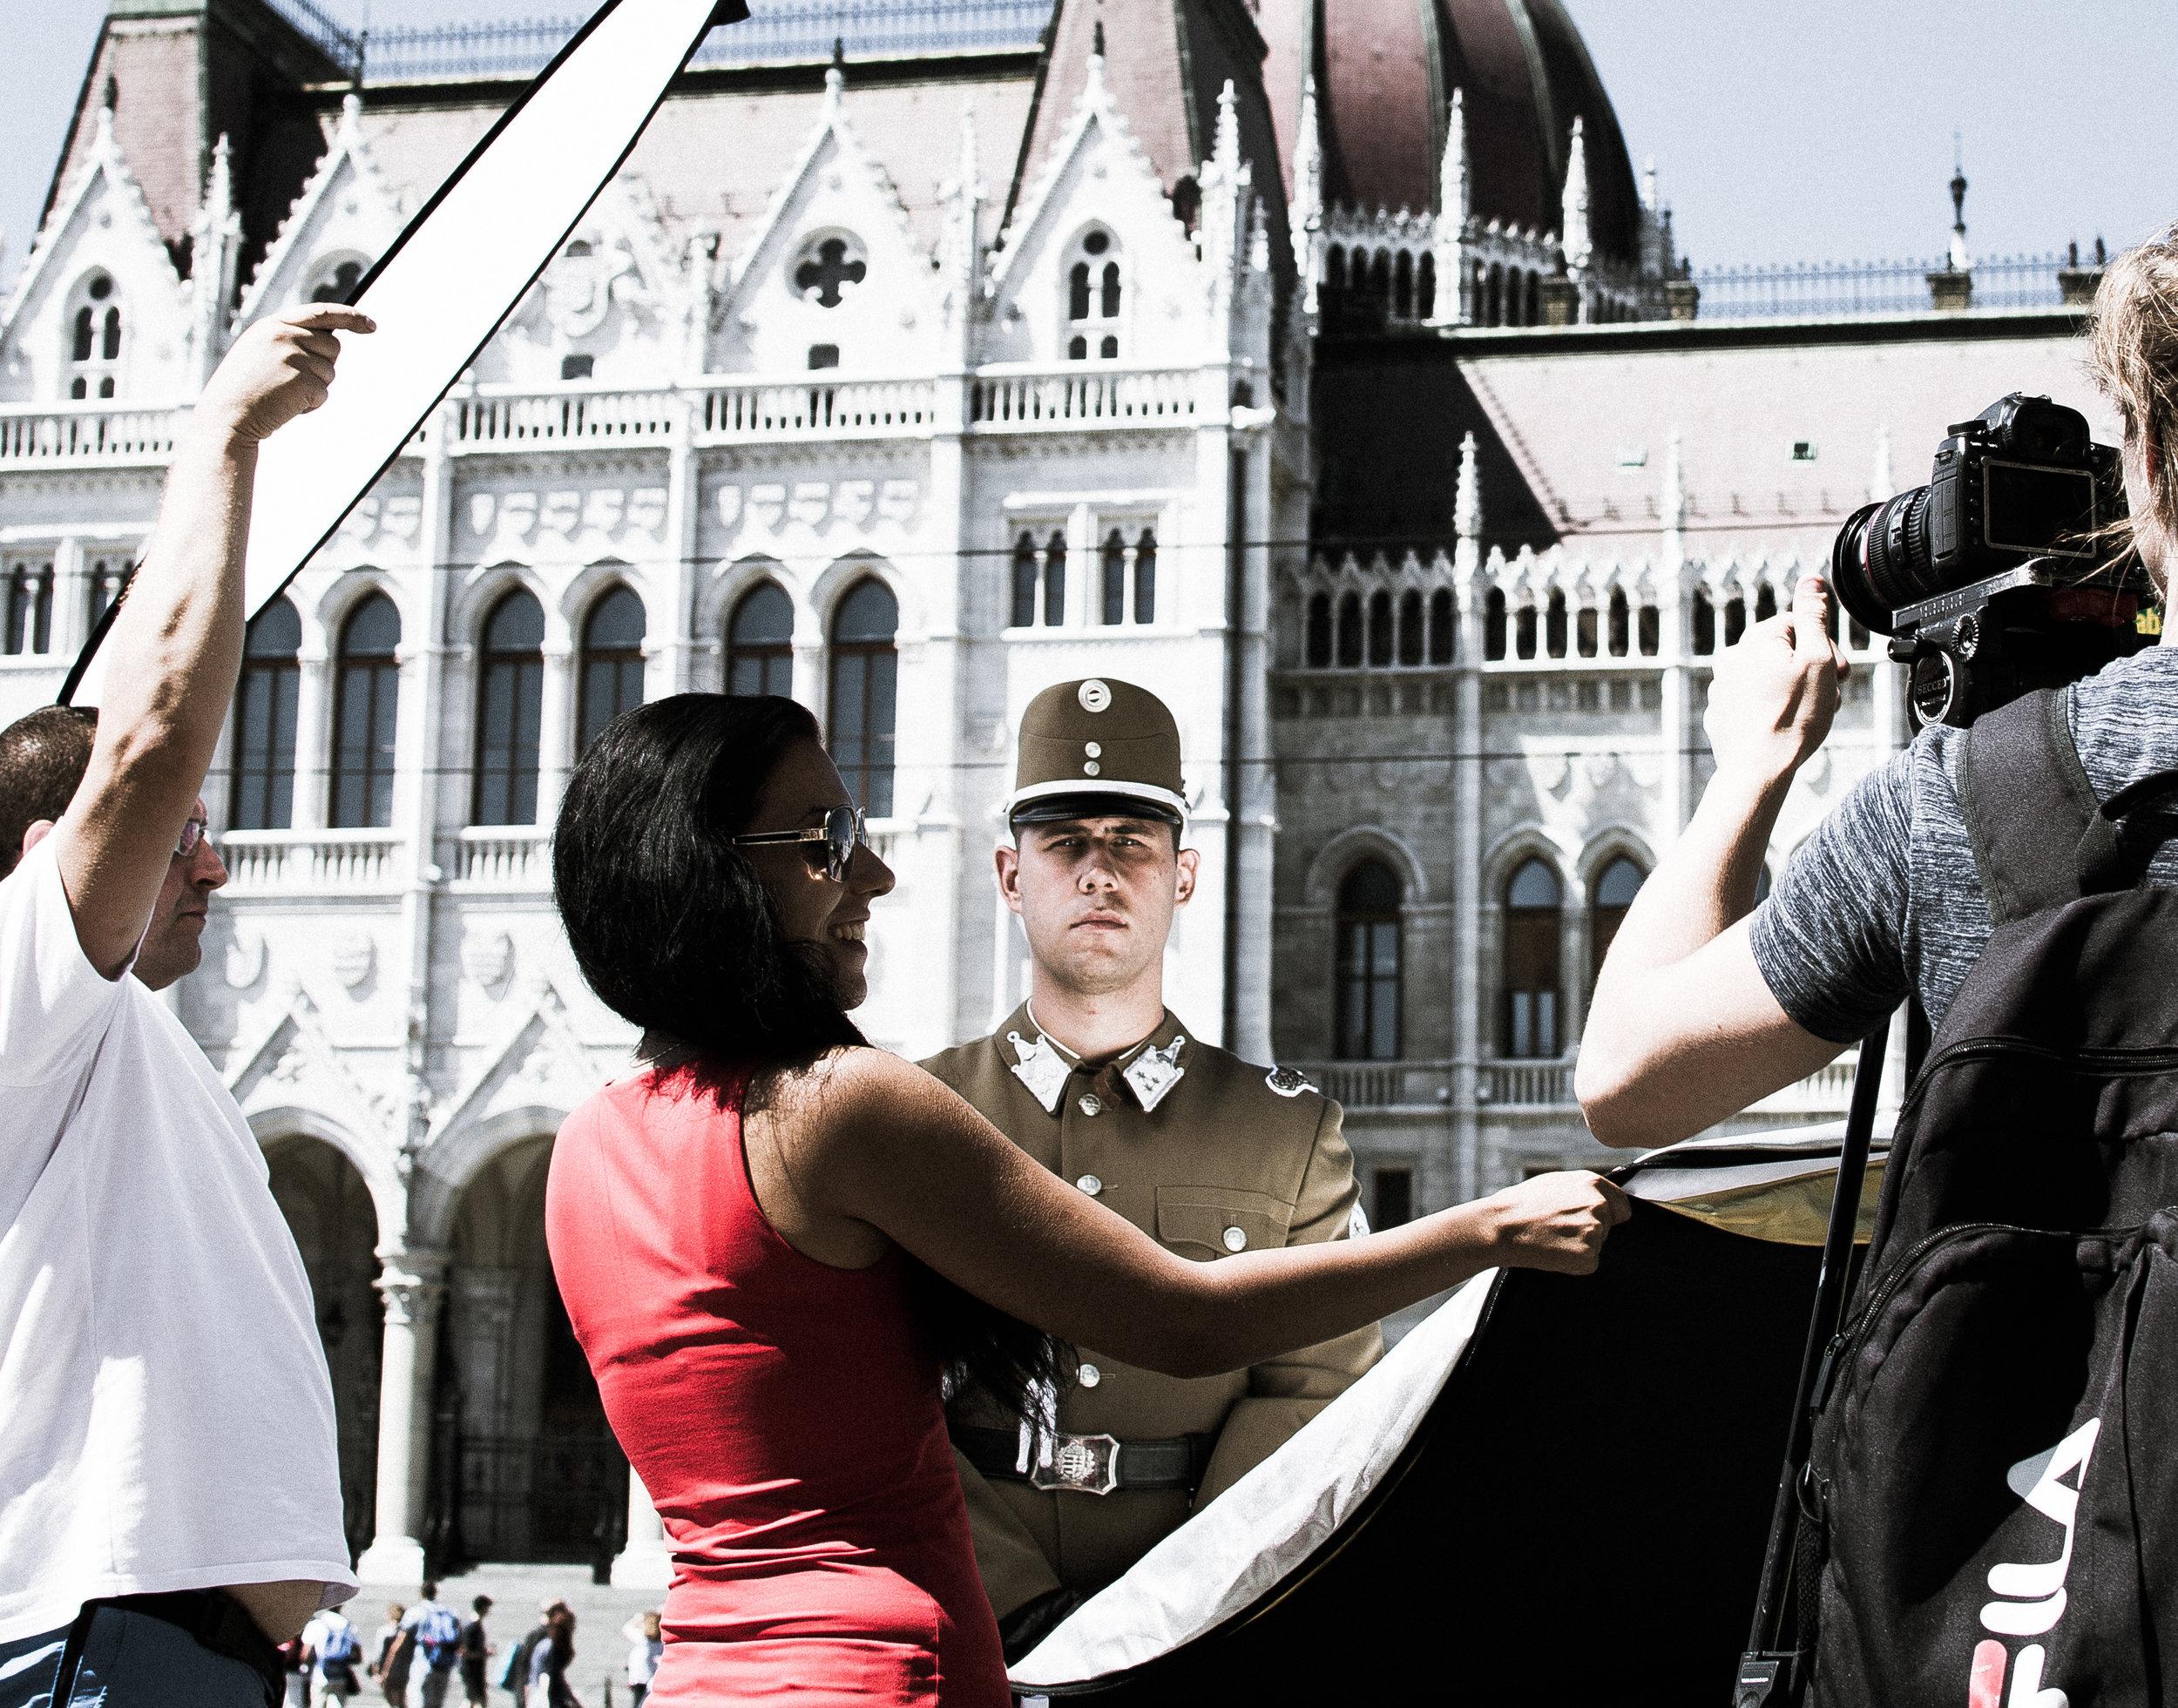 Photo Shoot Hijack - Budapest, Hungary